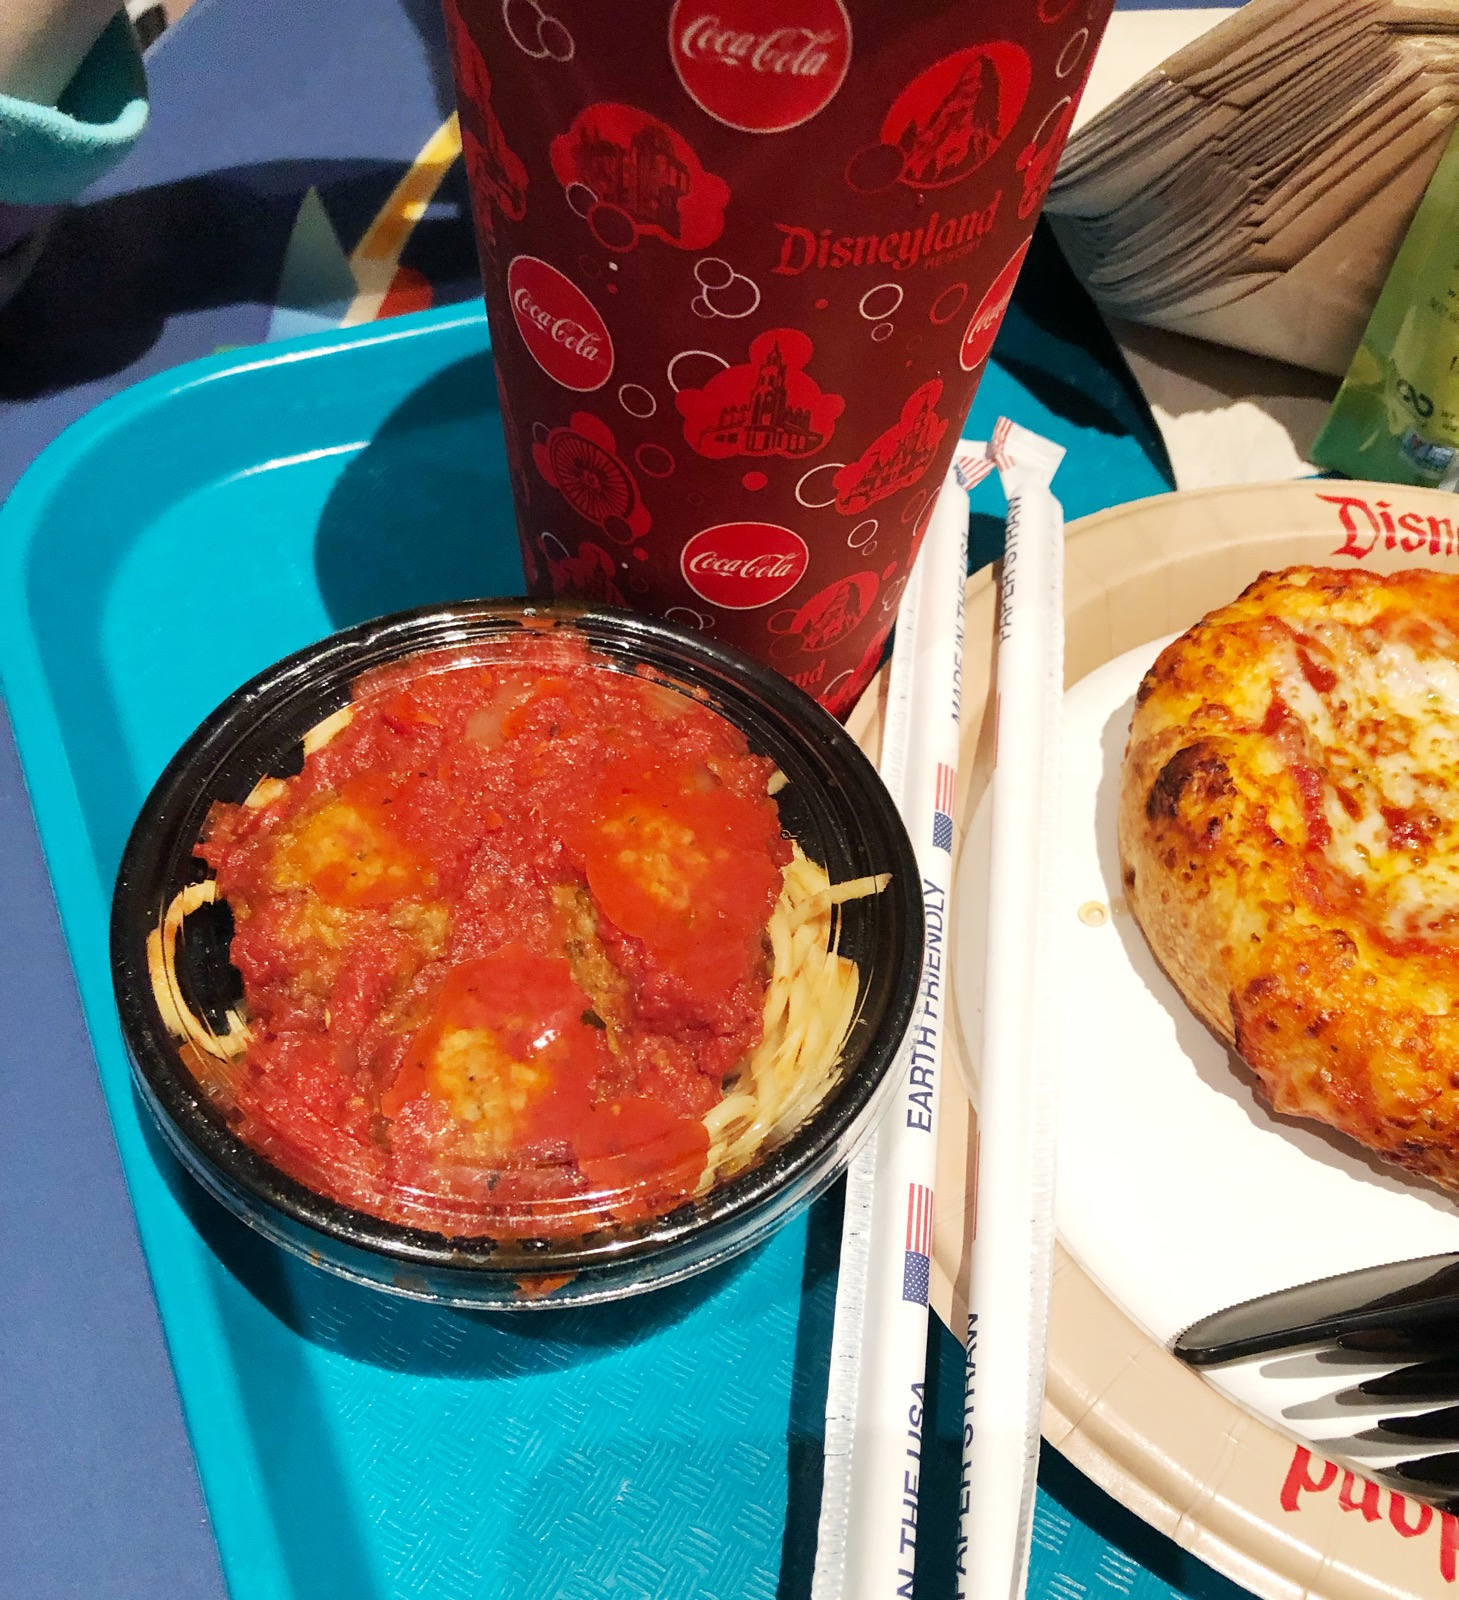 Where to find the best Spaghetti at Disneyland. #Disneyland #DisneyCaliforniaAdventure  #Disney #DisneyFood #DisneyFoodie